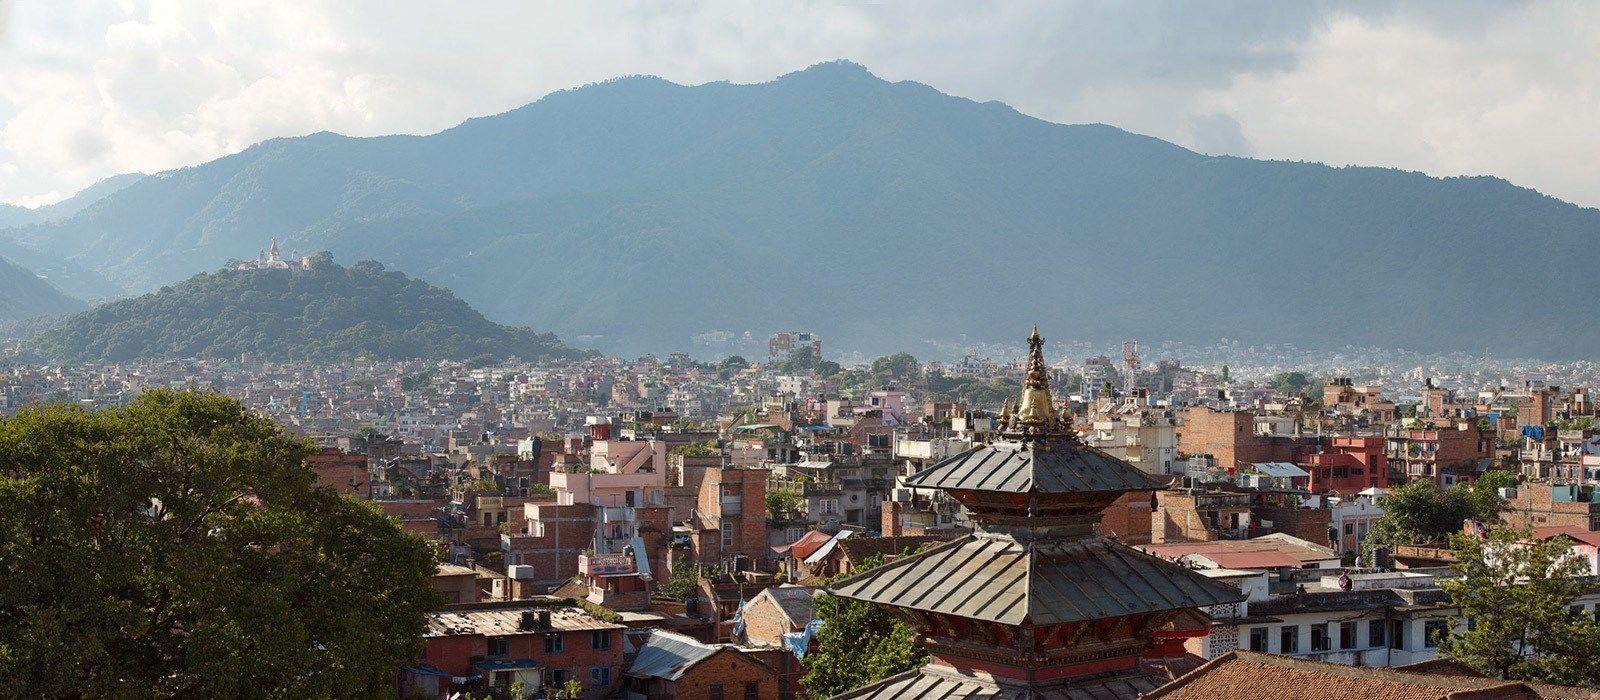 Nepal & Indien: Beeindruckender Himalaja & kulturelle Vielfalt Urlaub 3